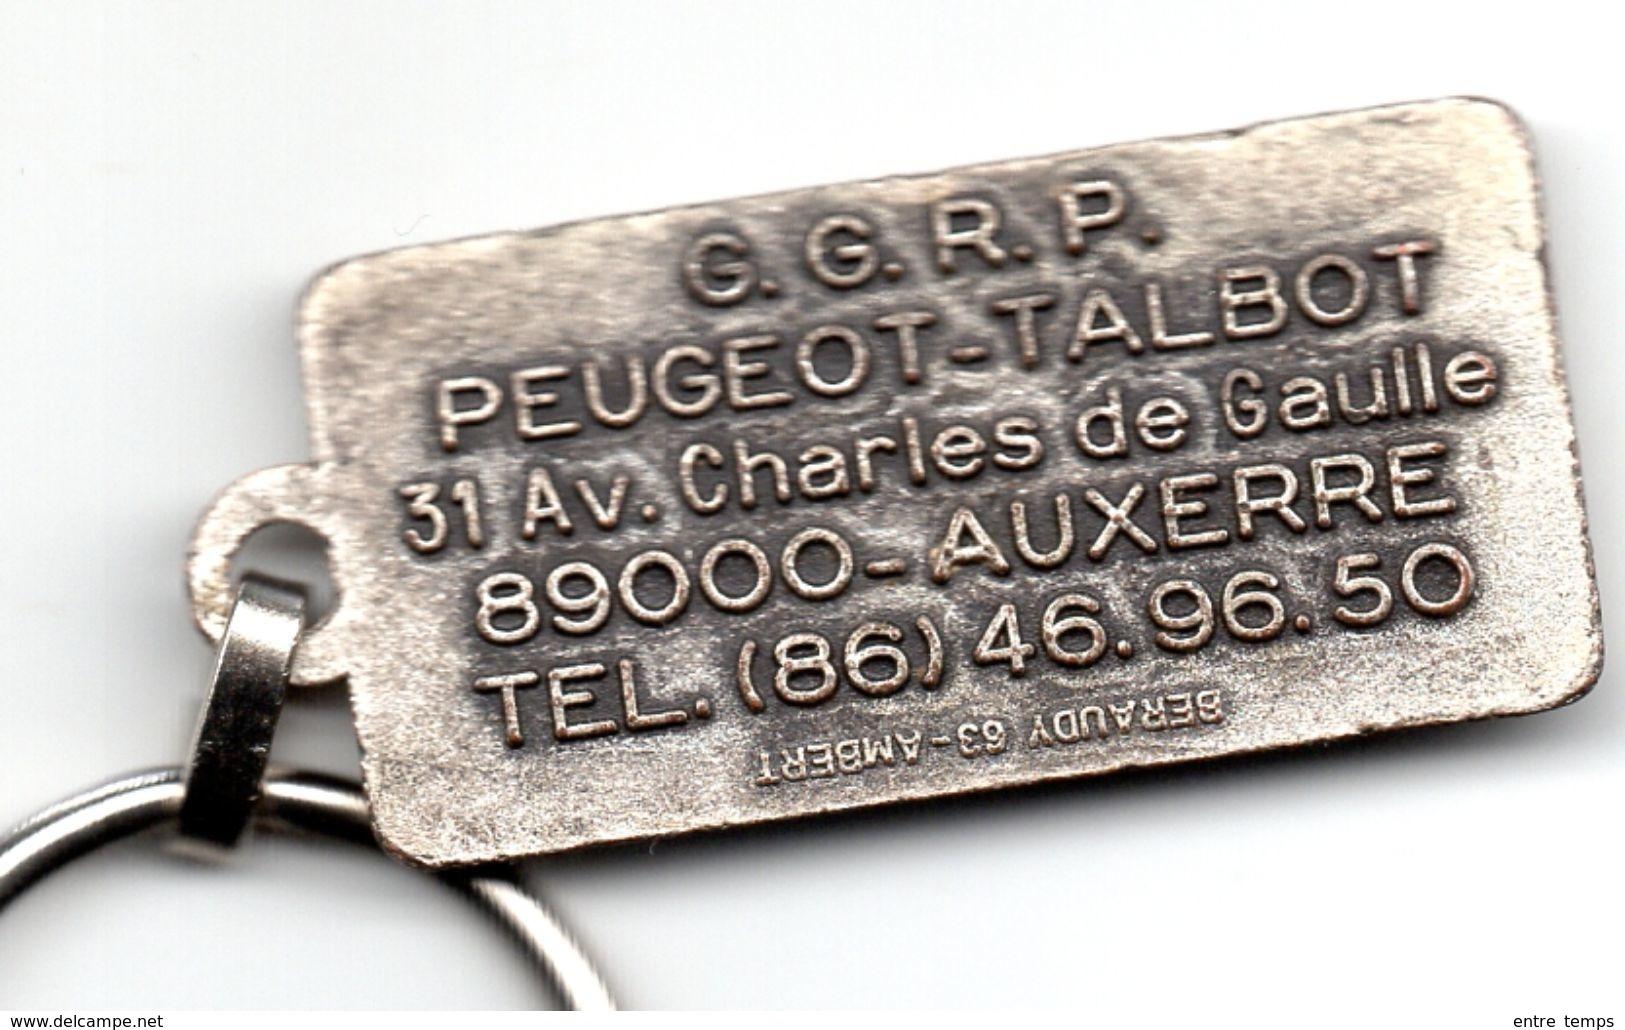 Porte Clefs Talbot  Auxerre Ets GGRP - Porte-clefs